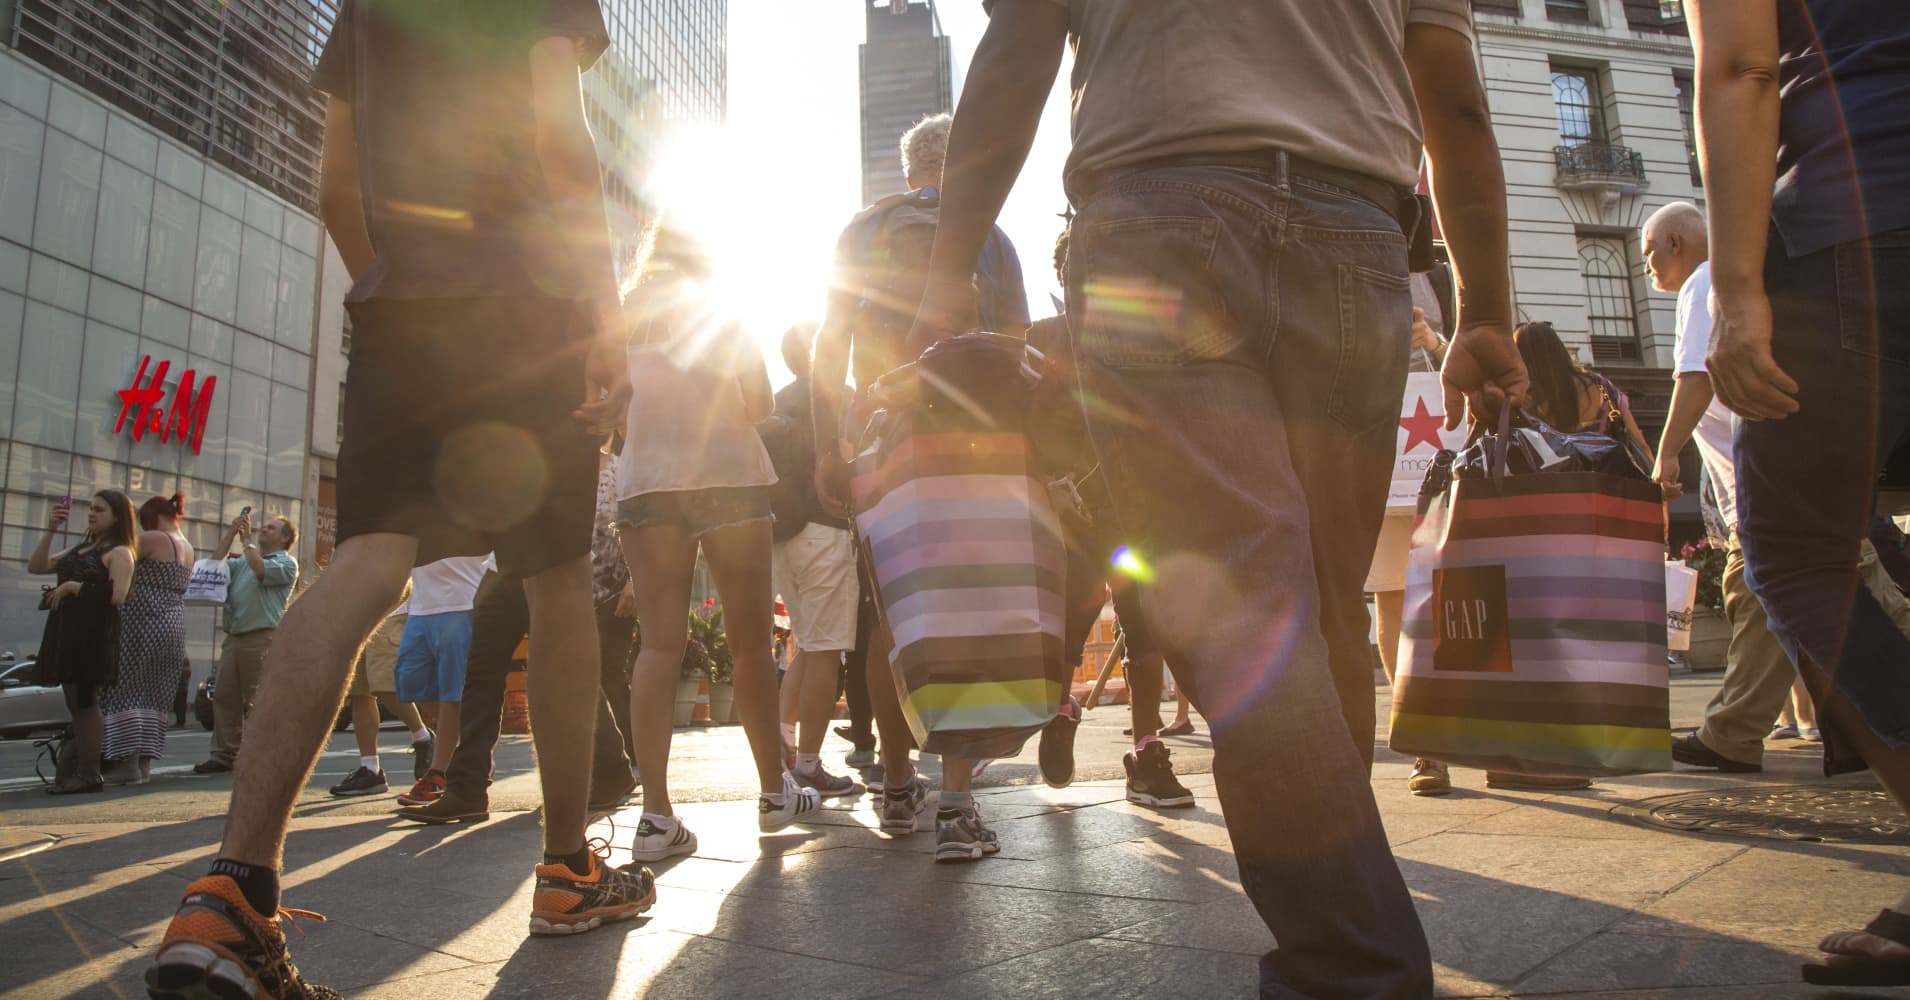 Hasil gambar untuk U.S. Consumer Confidence Reaches Highest Level Since 2000